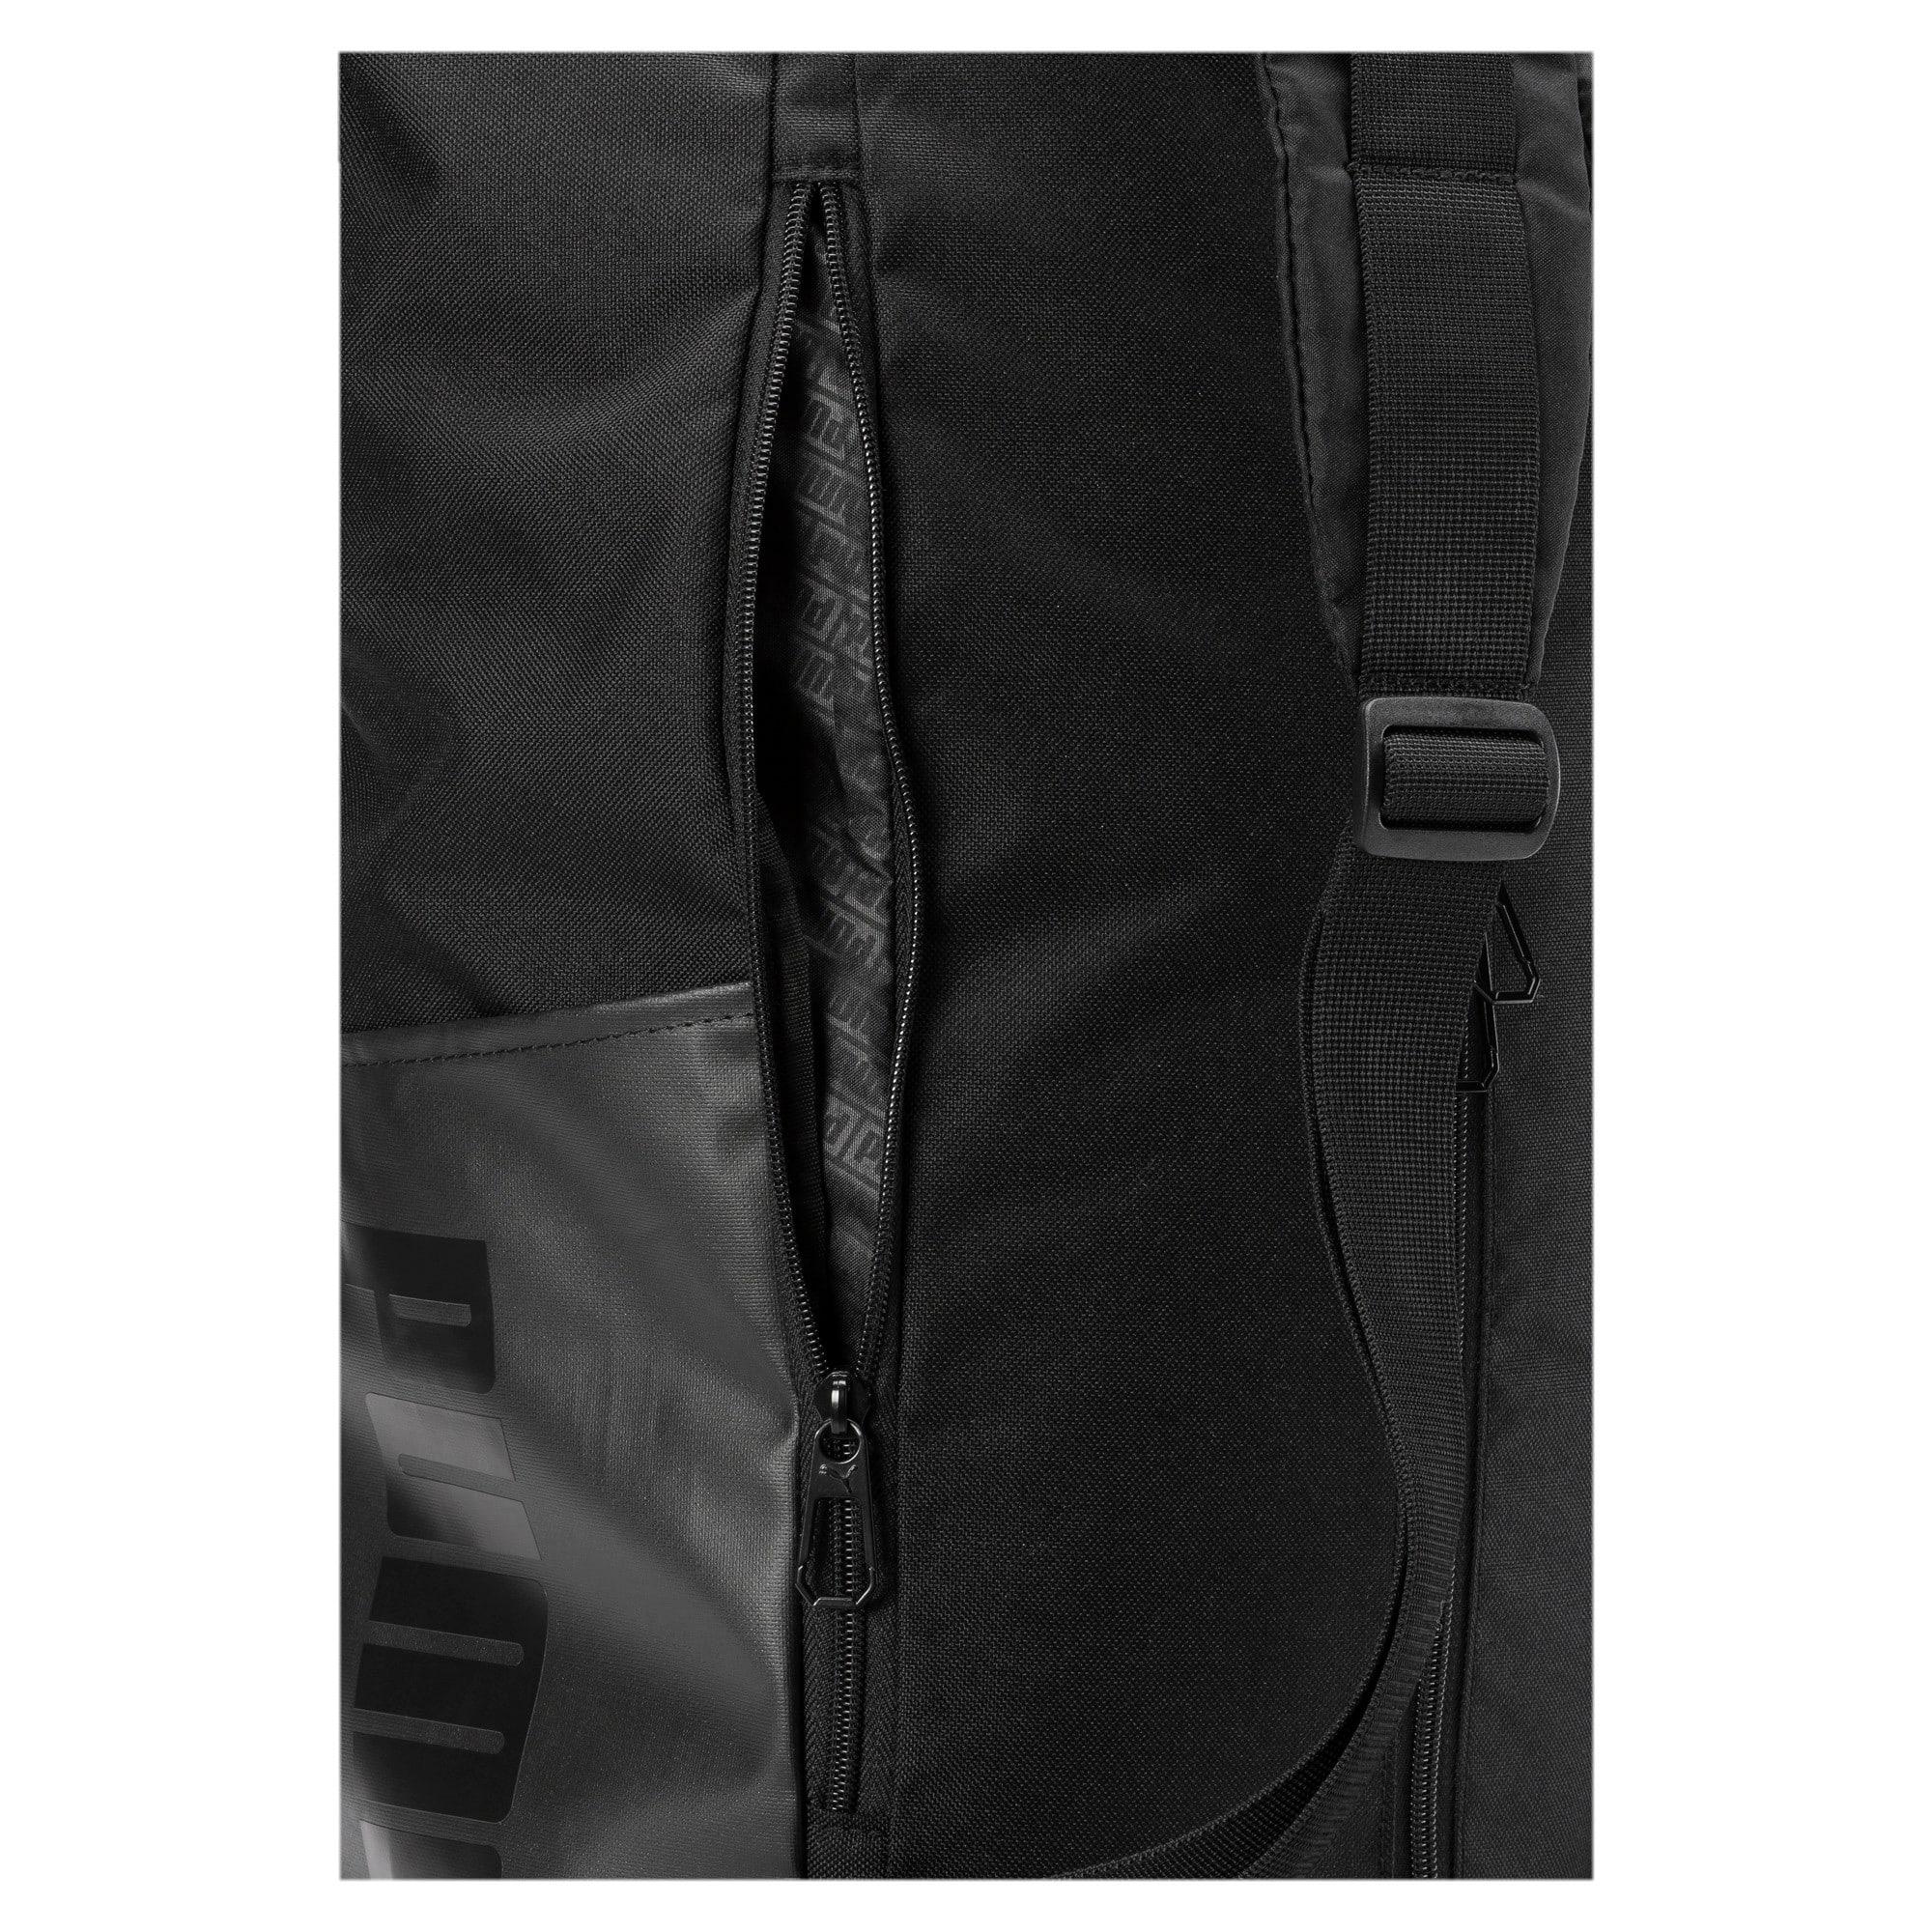 Thumbnail 4 of Training Transform Duffle Bag, Puma Black, medium-IND